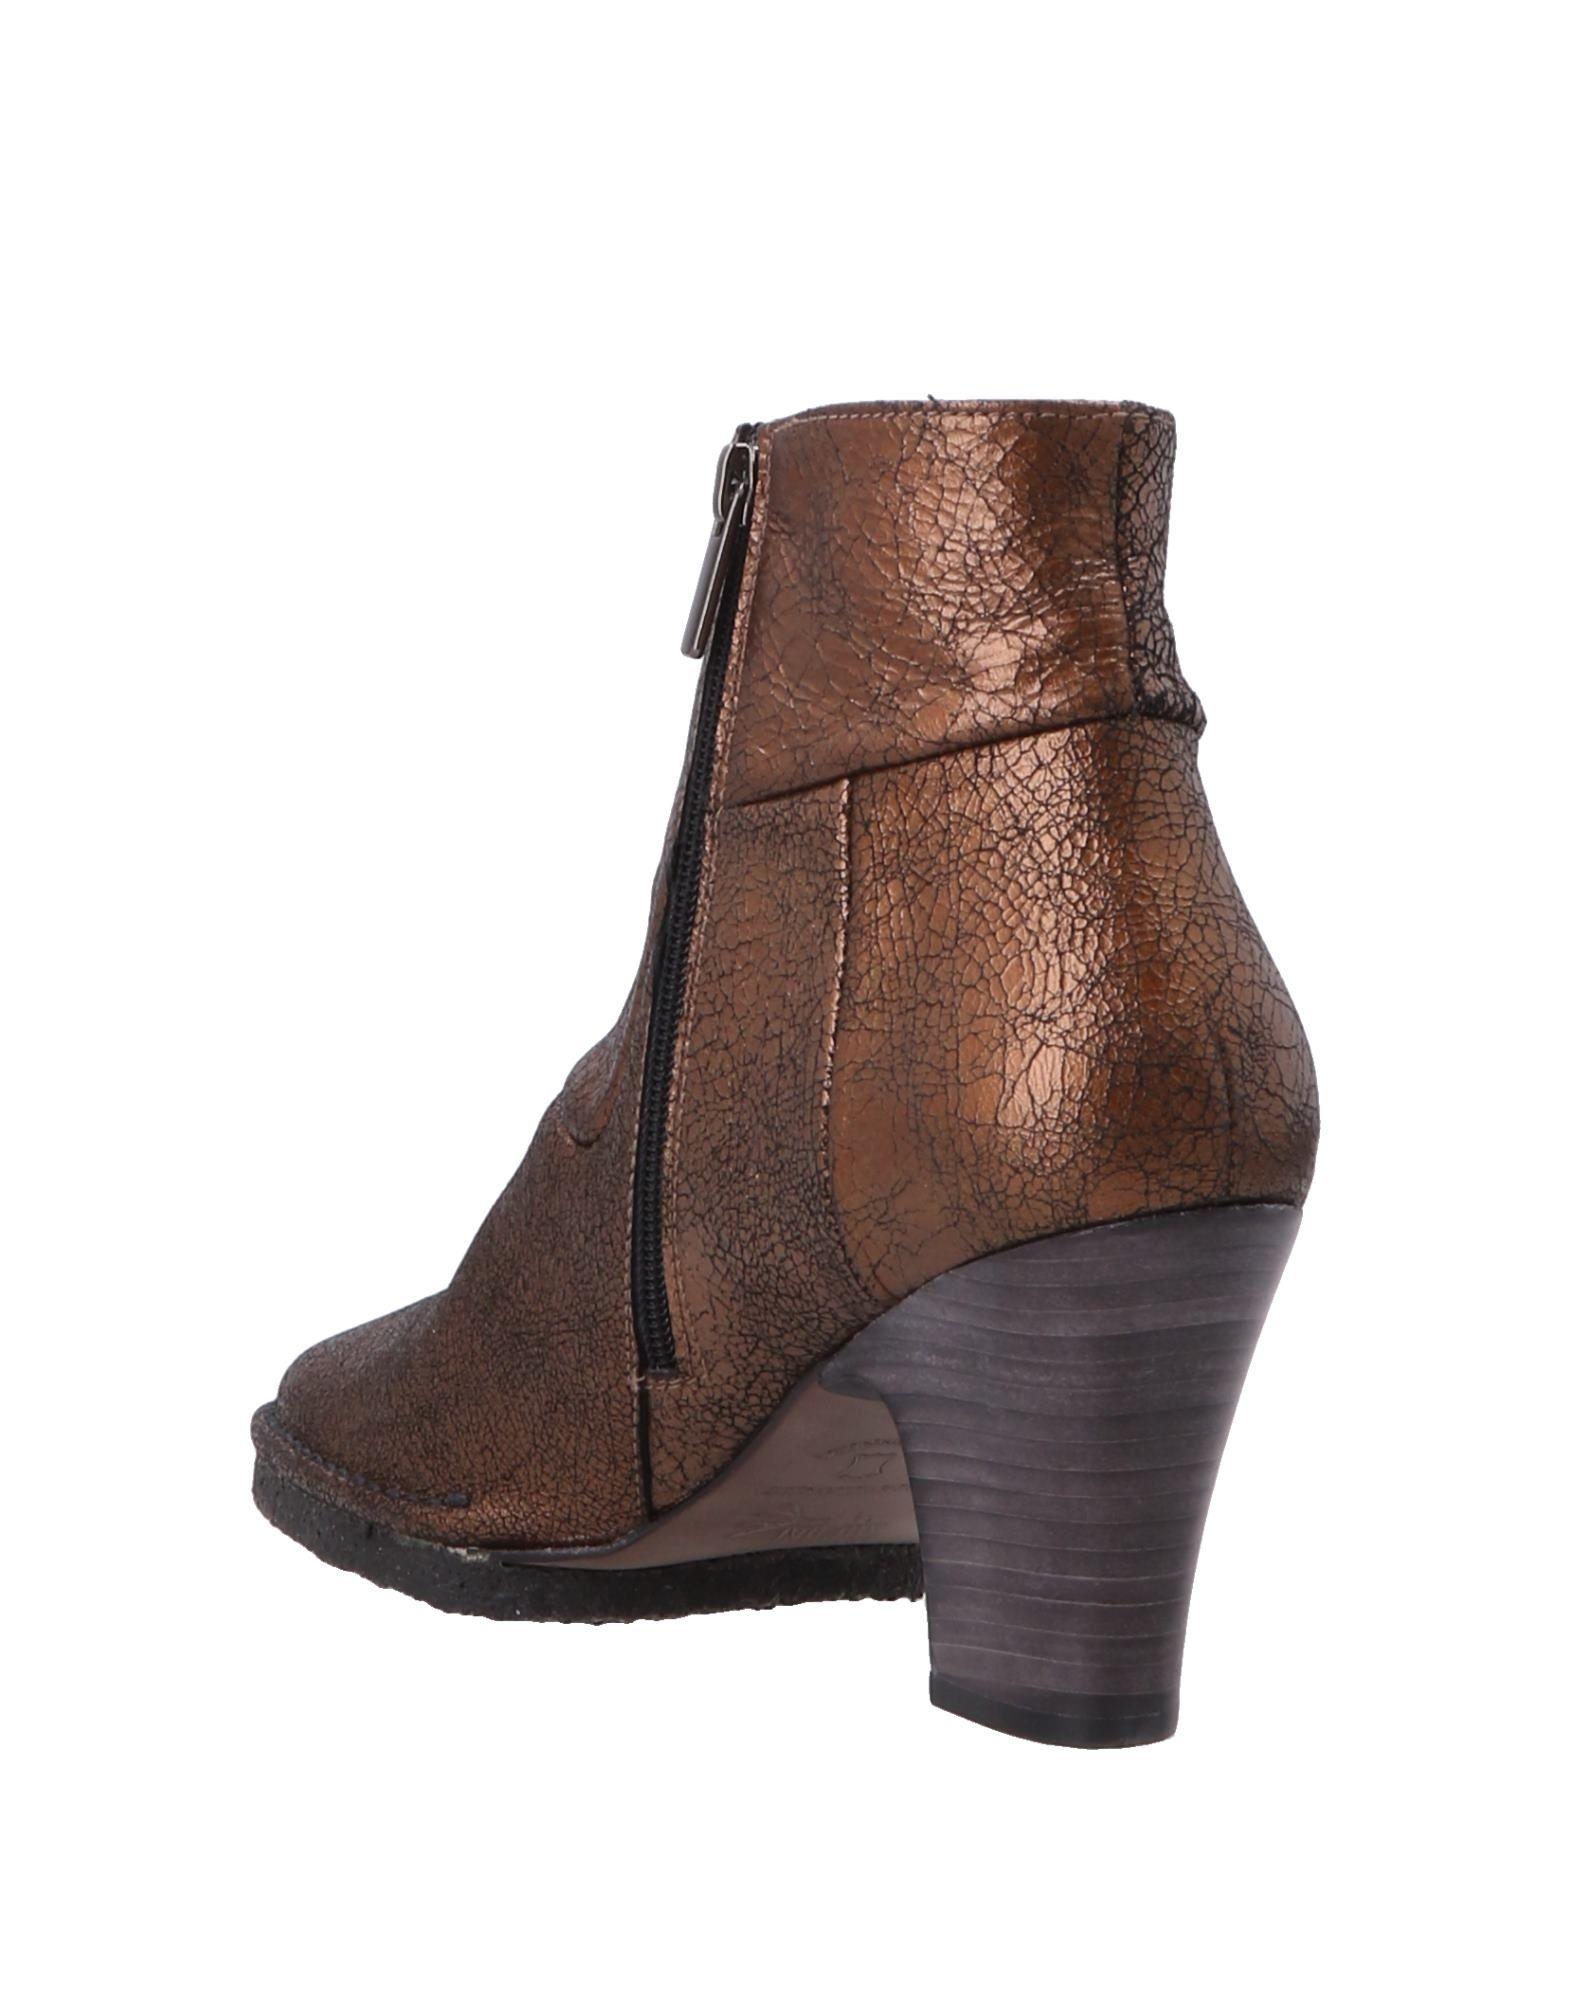 Gut Kupuri um billige Schuhe zu tragenAnaid Kupuri Gut Stiefelette Damen  11546142PM 1e2cc8